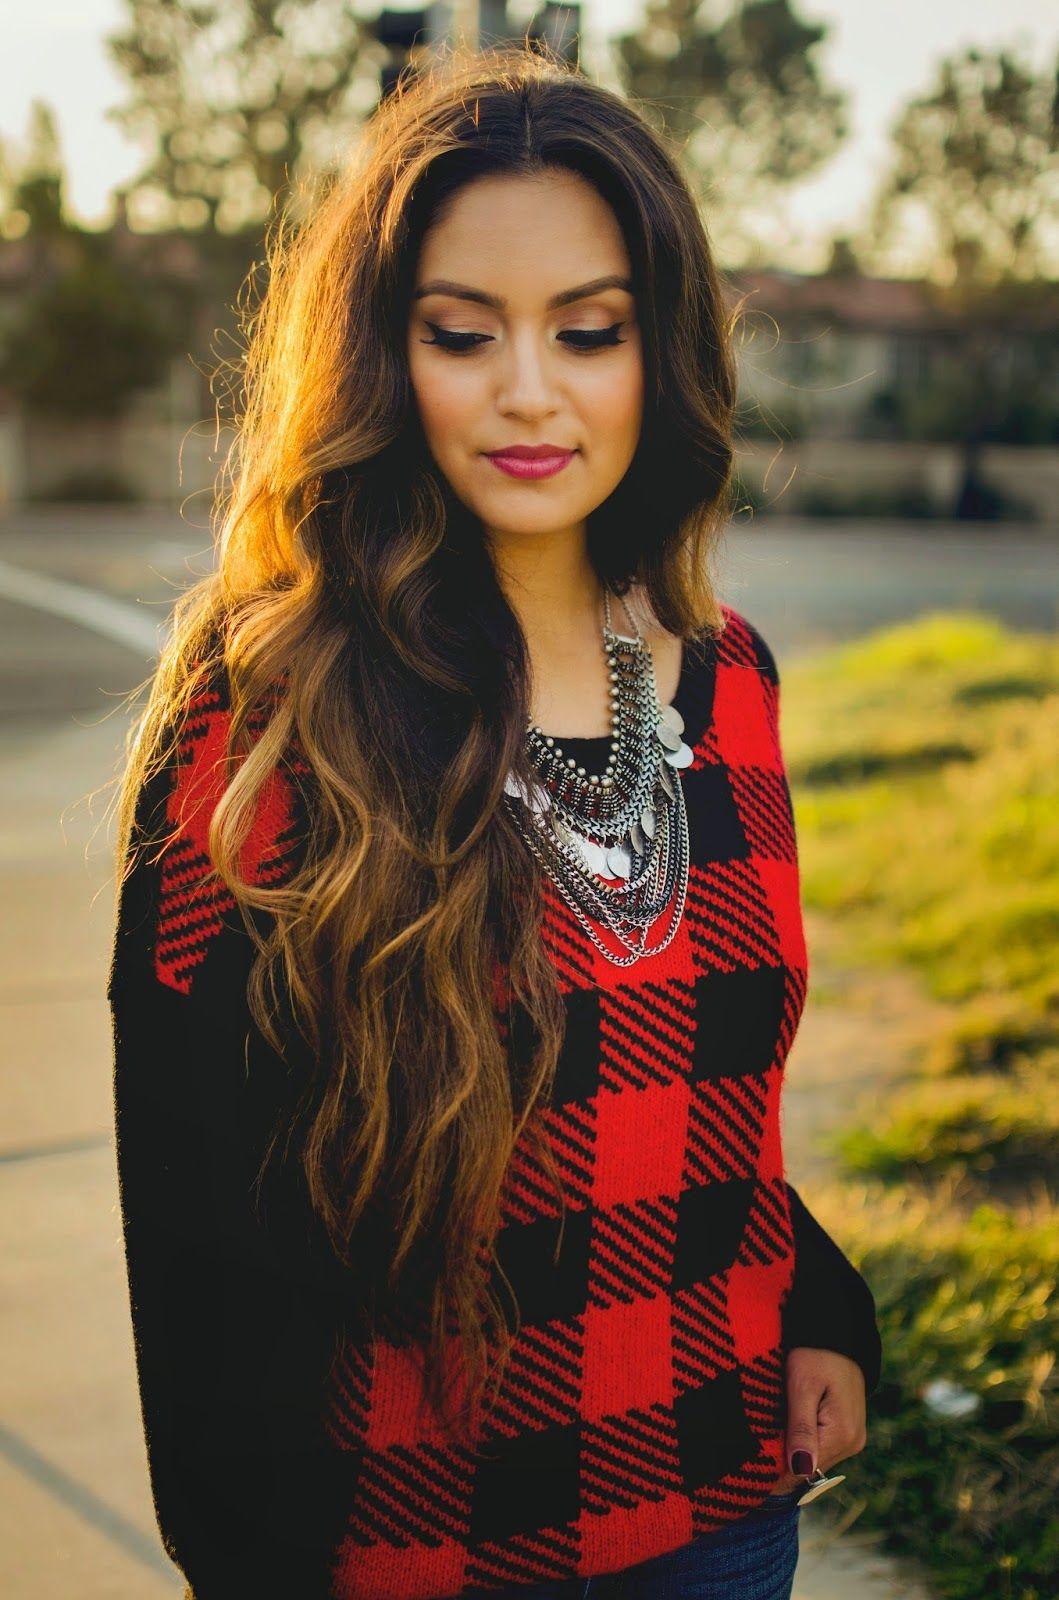 Vanessa balli makeup pinterest plaid mad and fashion